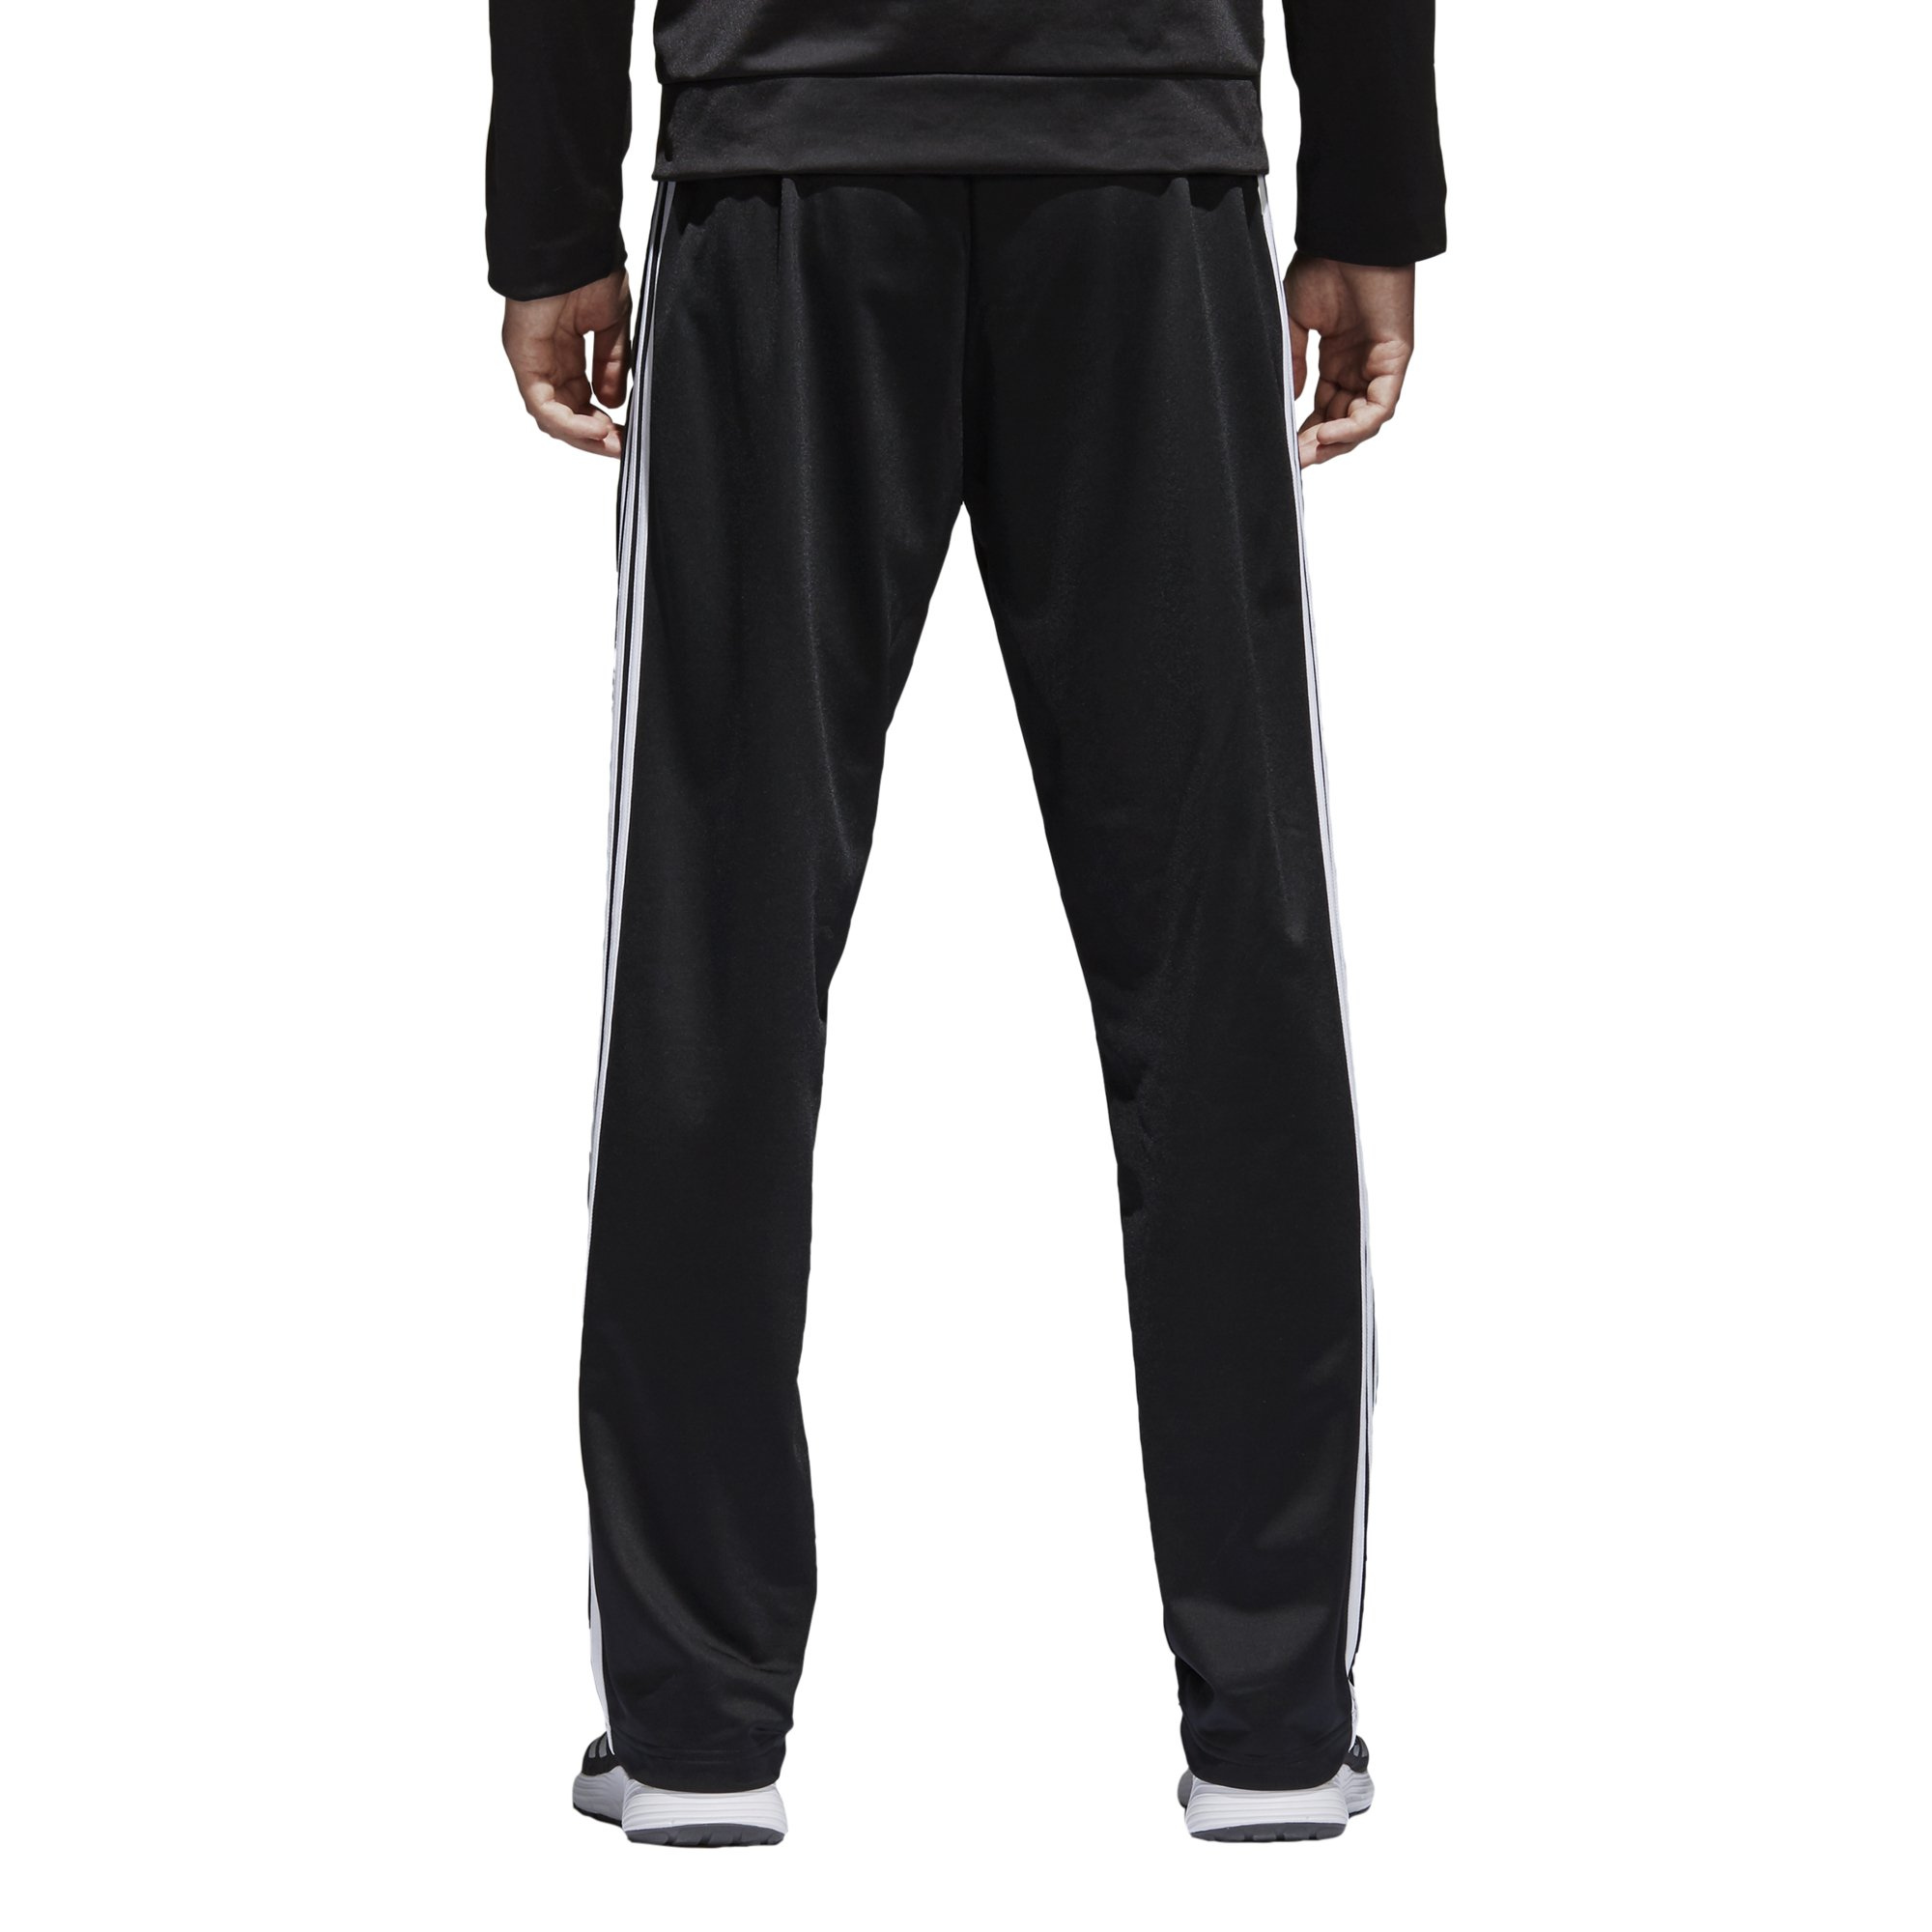 adidas Men's Athletics Essential Tricot 3-Stripe Pants, Black/White, Small by adidas (Image #5)